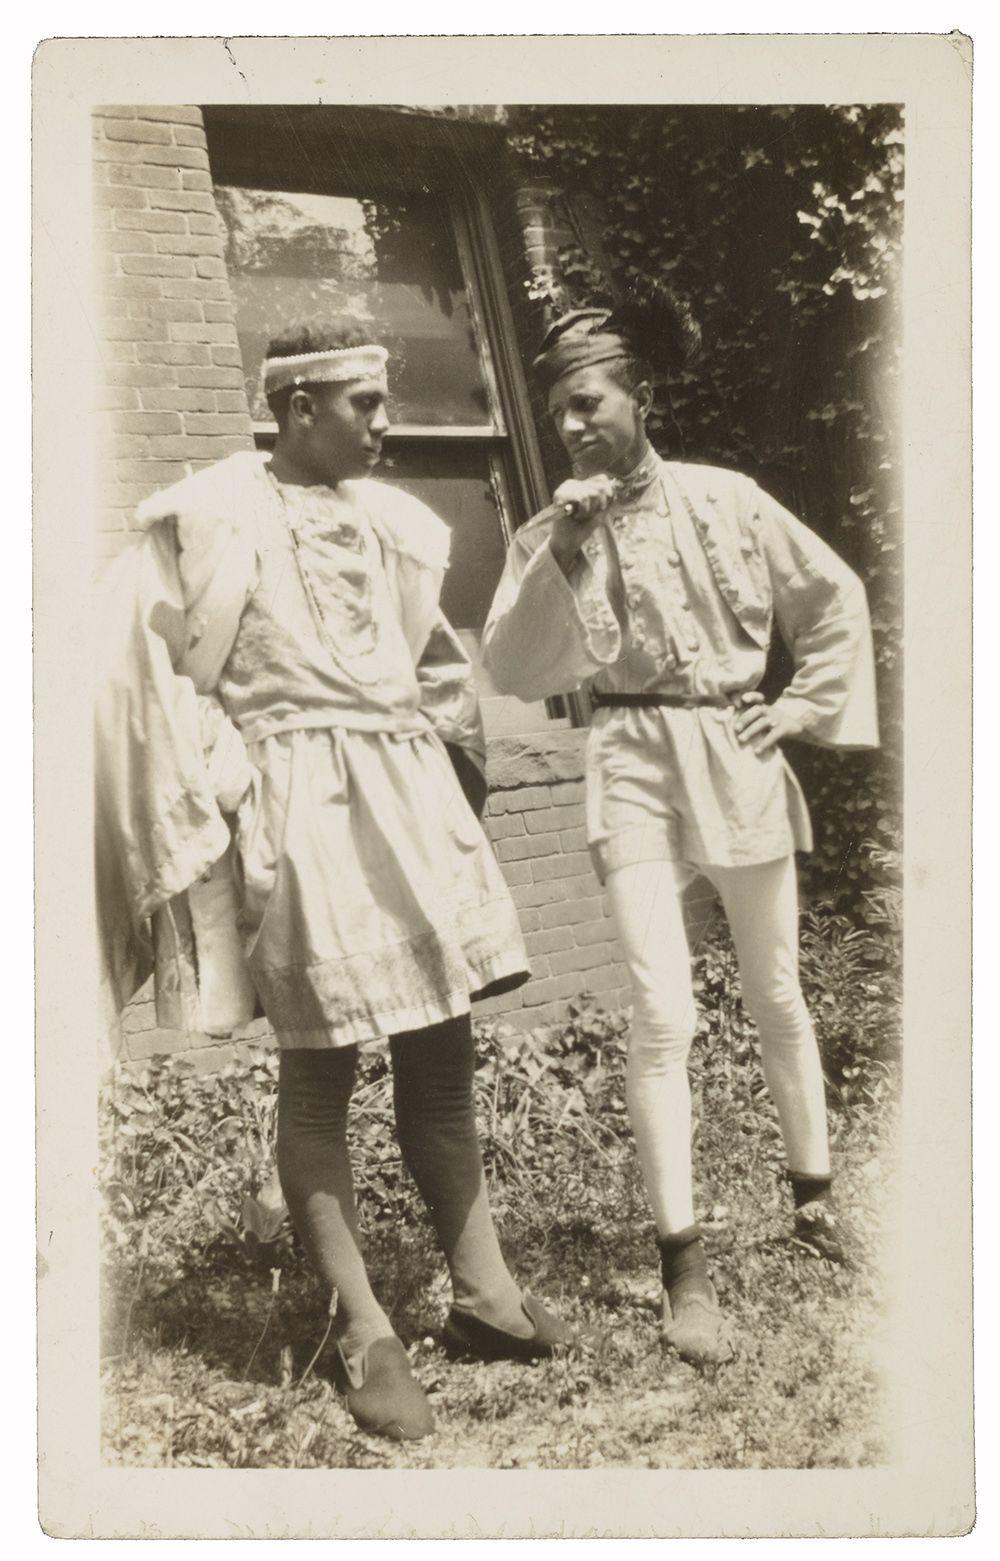 Two Howard University students wearing Renaissance-style costumes designed by Alma Thomas.